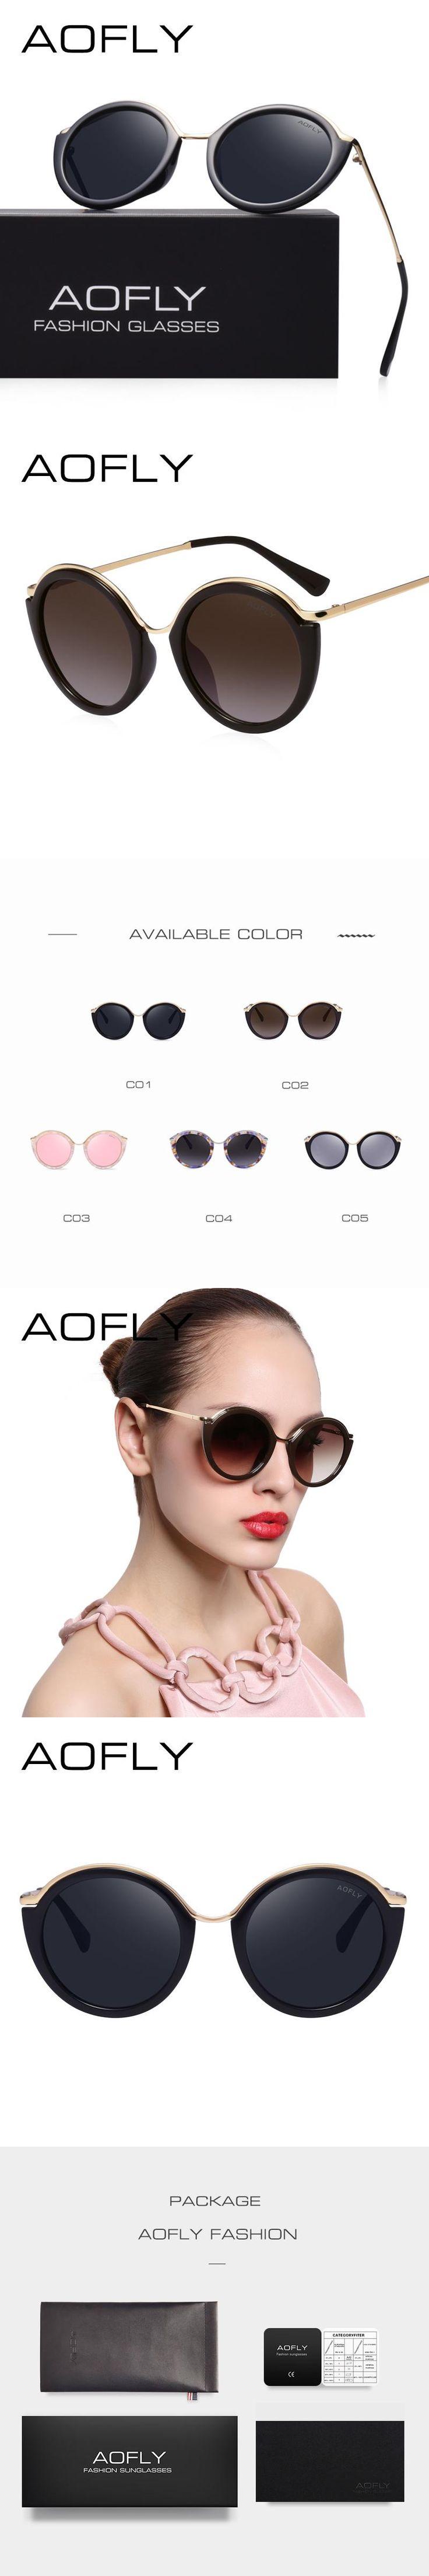 AOFLY Fashion Vintage Round Sunglasses Women Brand Design Sunglasses Eyeglasses Alloy Legs Shades Lunettes de soleil AF7909